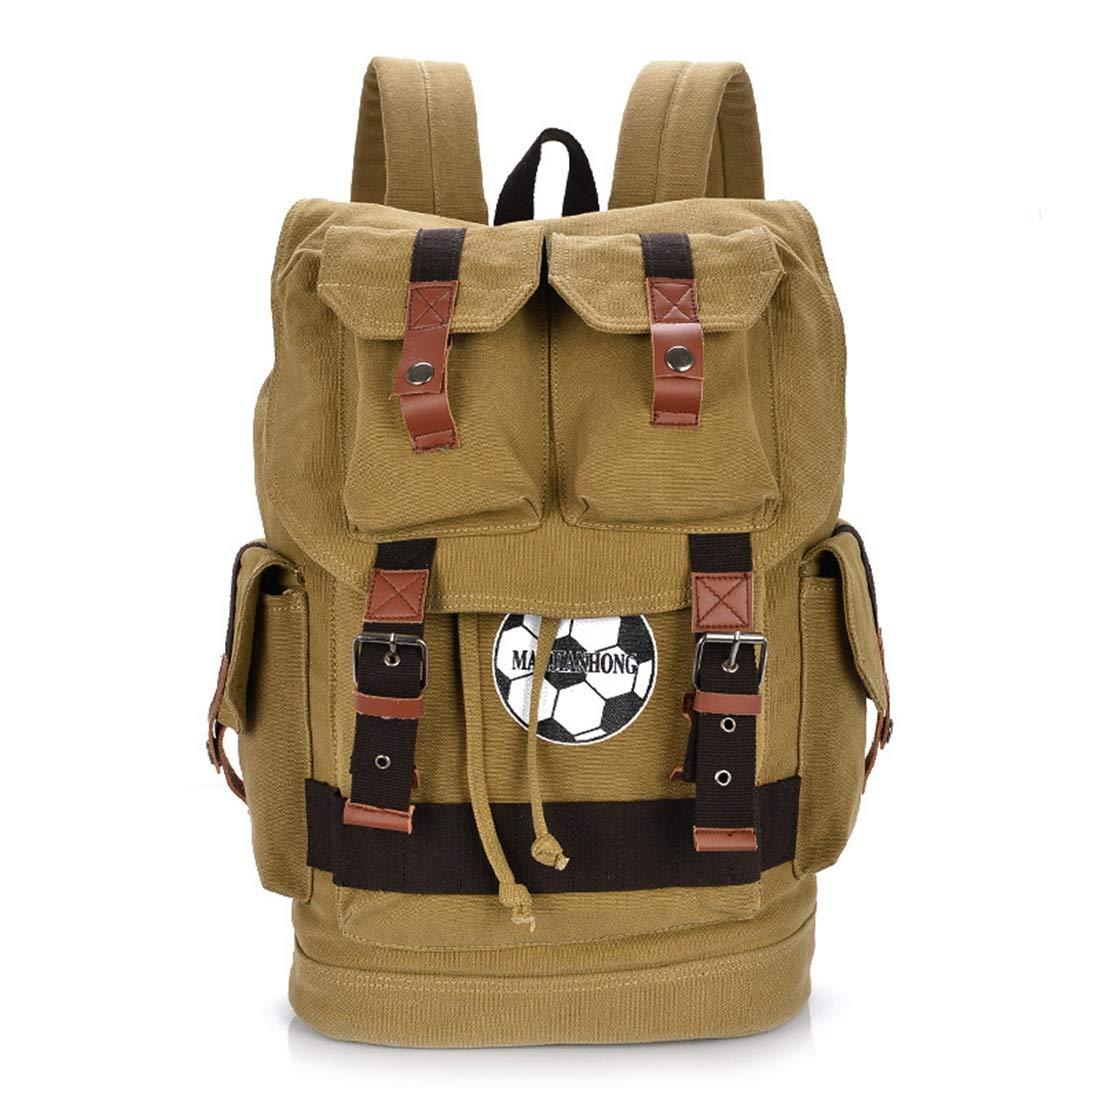 UICICI Canvas Bag Männer und Frauen Rucksack Outdoor Wear Breathable Large Capacity Casual Canvas Rucksack (Farbe   Khaki) B07NVNG94V Daypacks Verrückter Preis